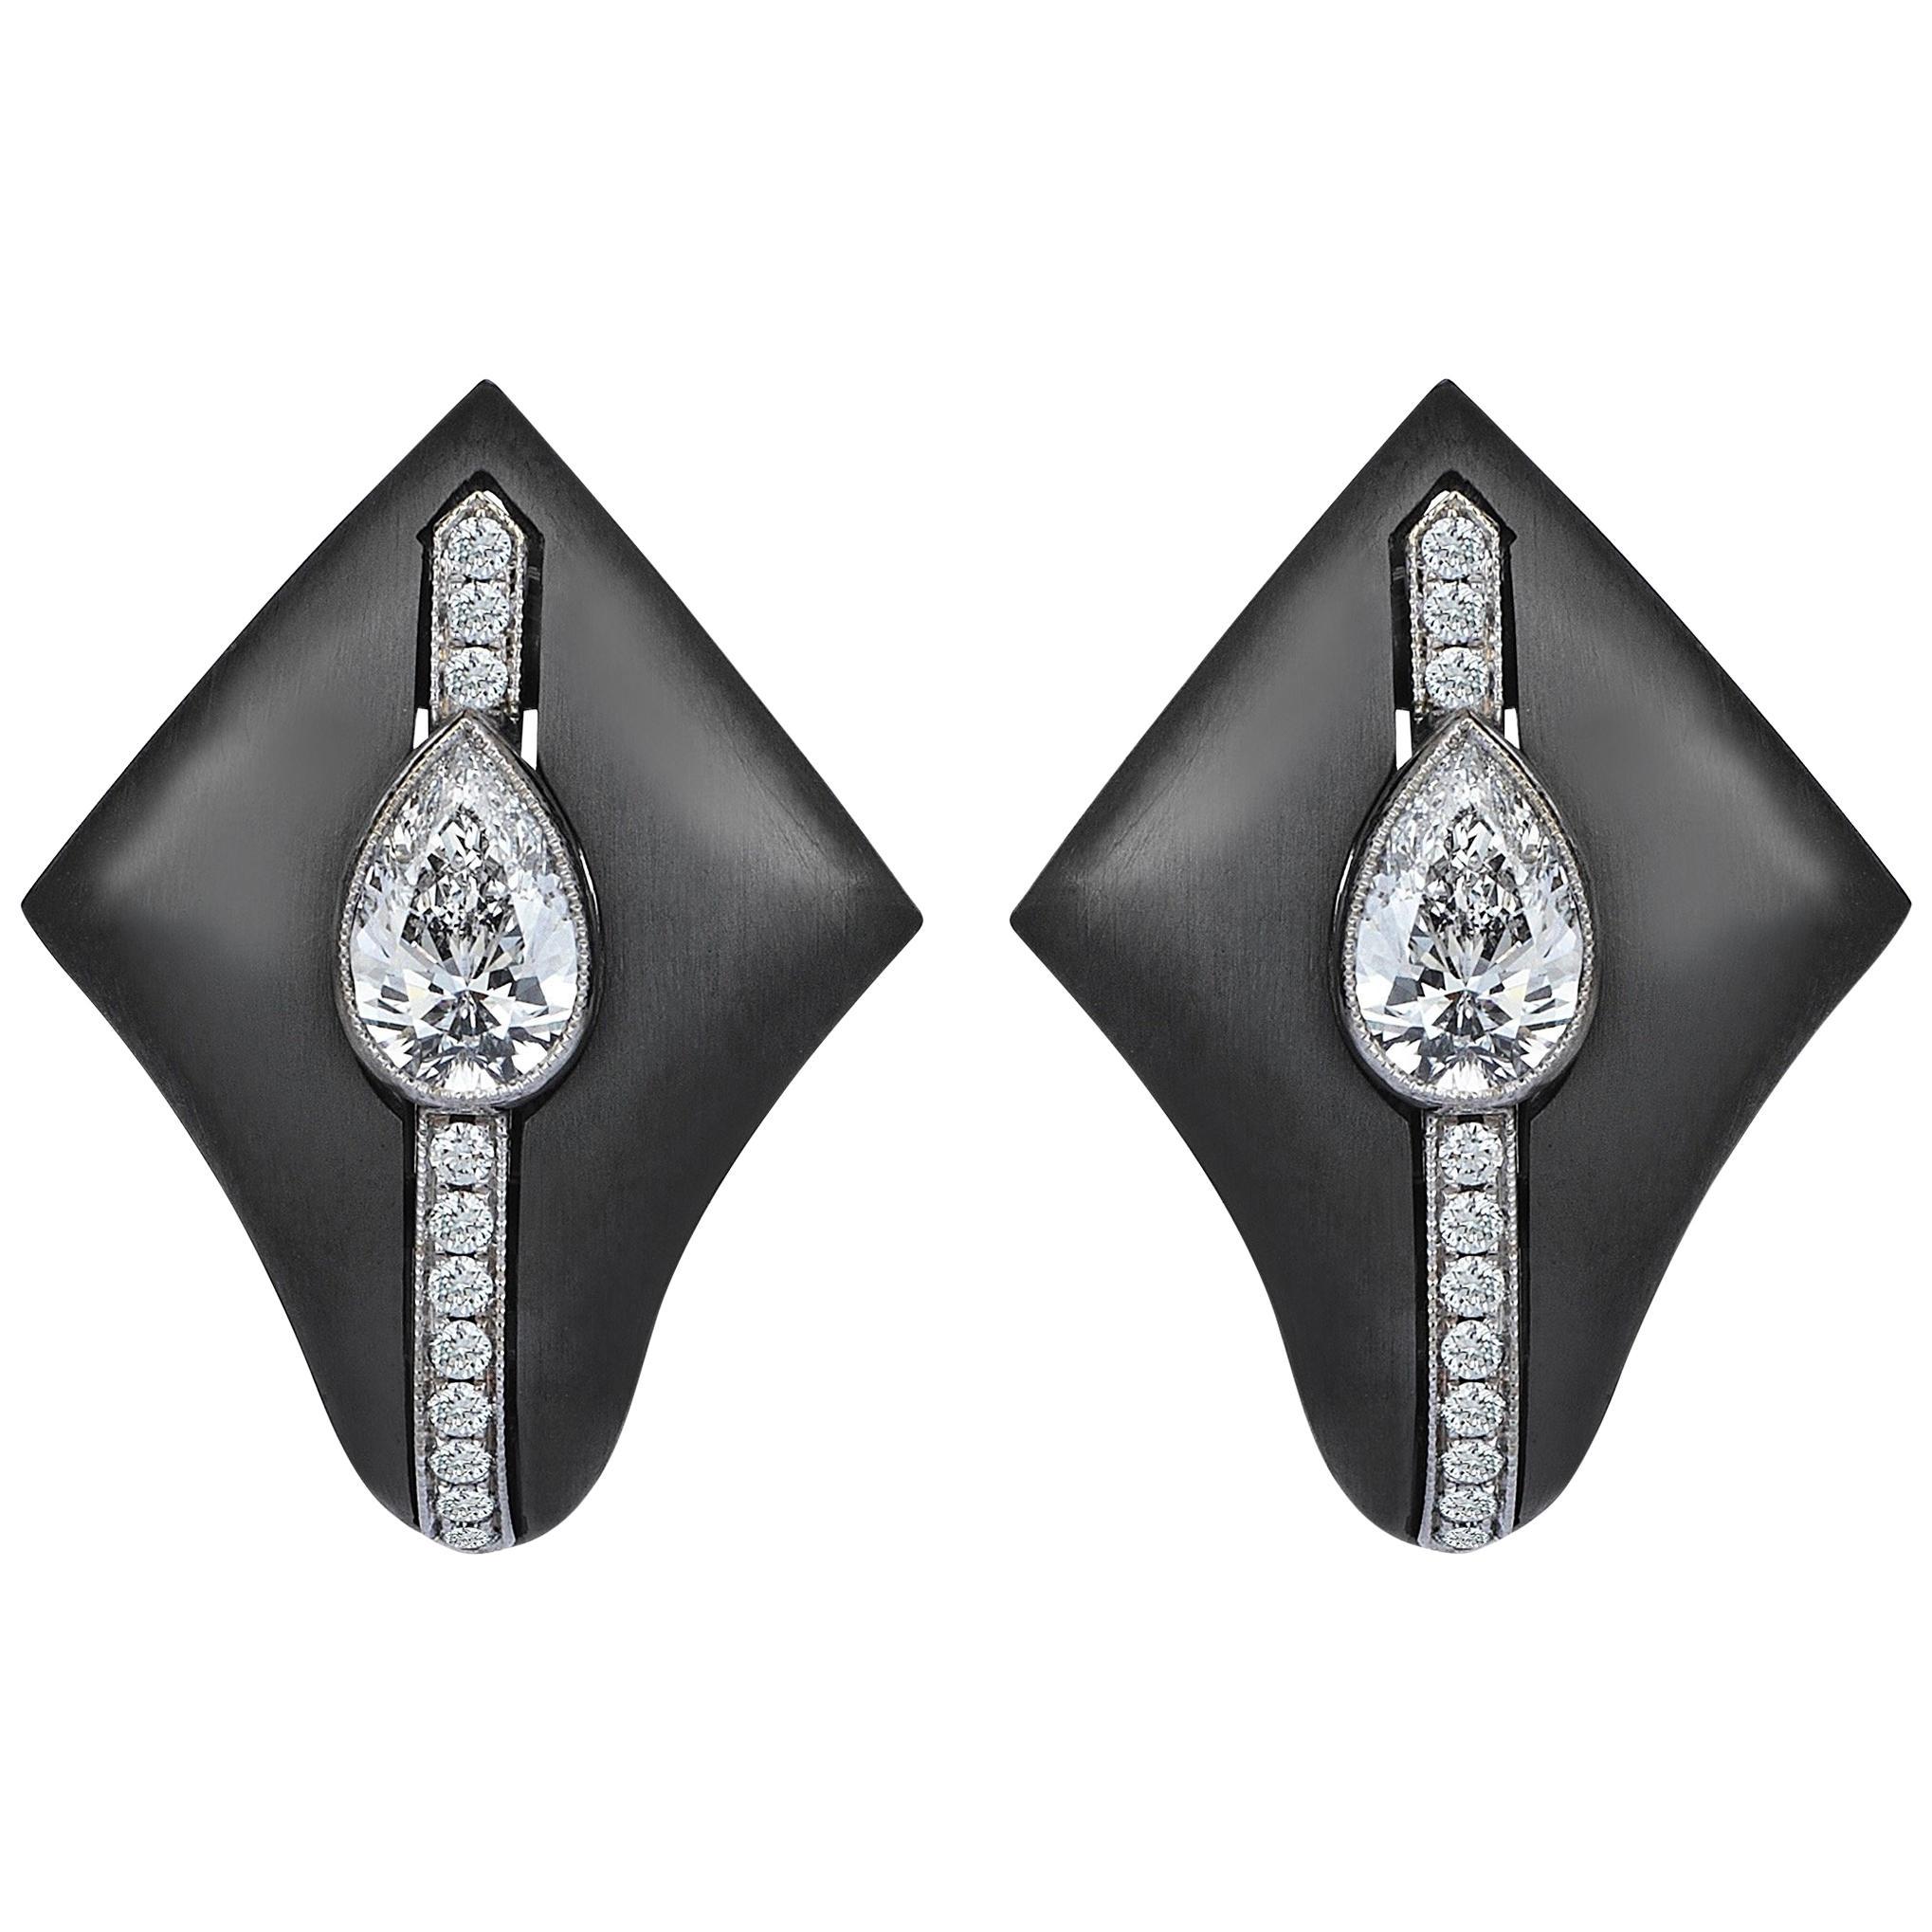 18 Karat Gold Monan Black Kingdom 1.05 Carat Diamond Earrings